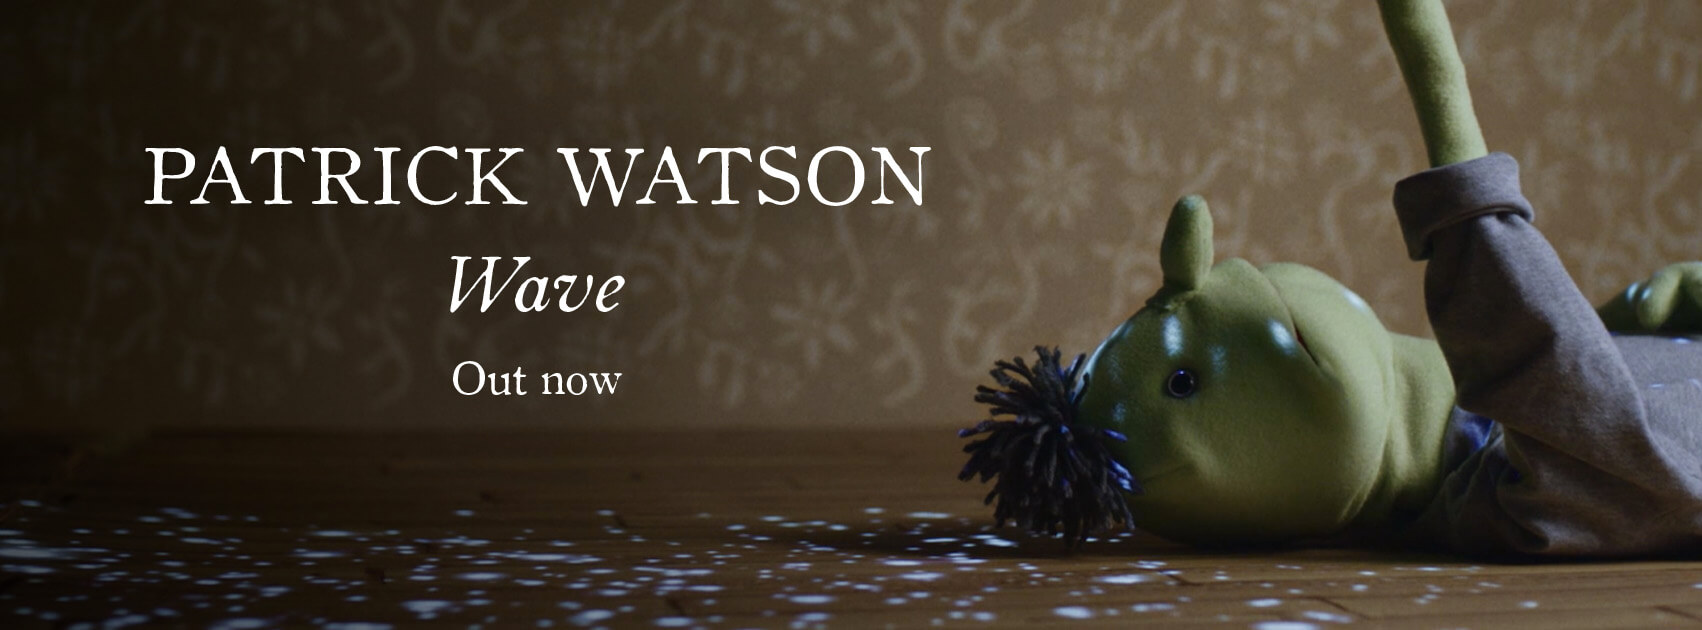 Patrick Watson Wave shop vinyl